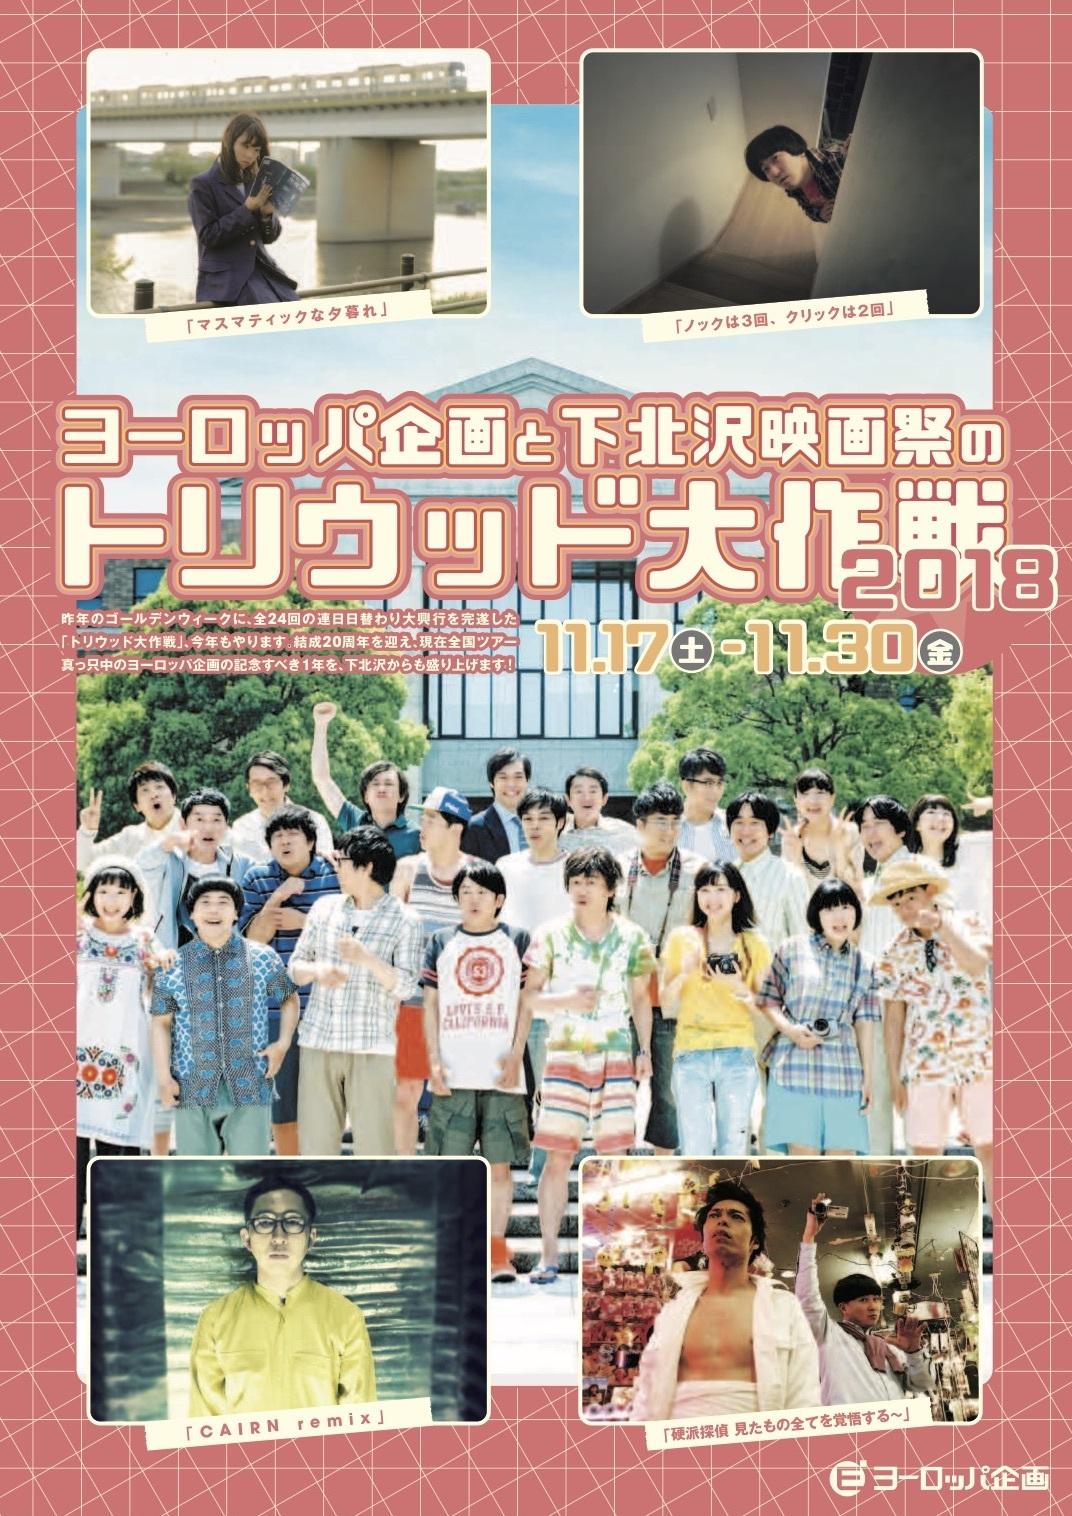 (C) ヨーロッパ企画 (C)下北沢映画祭